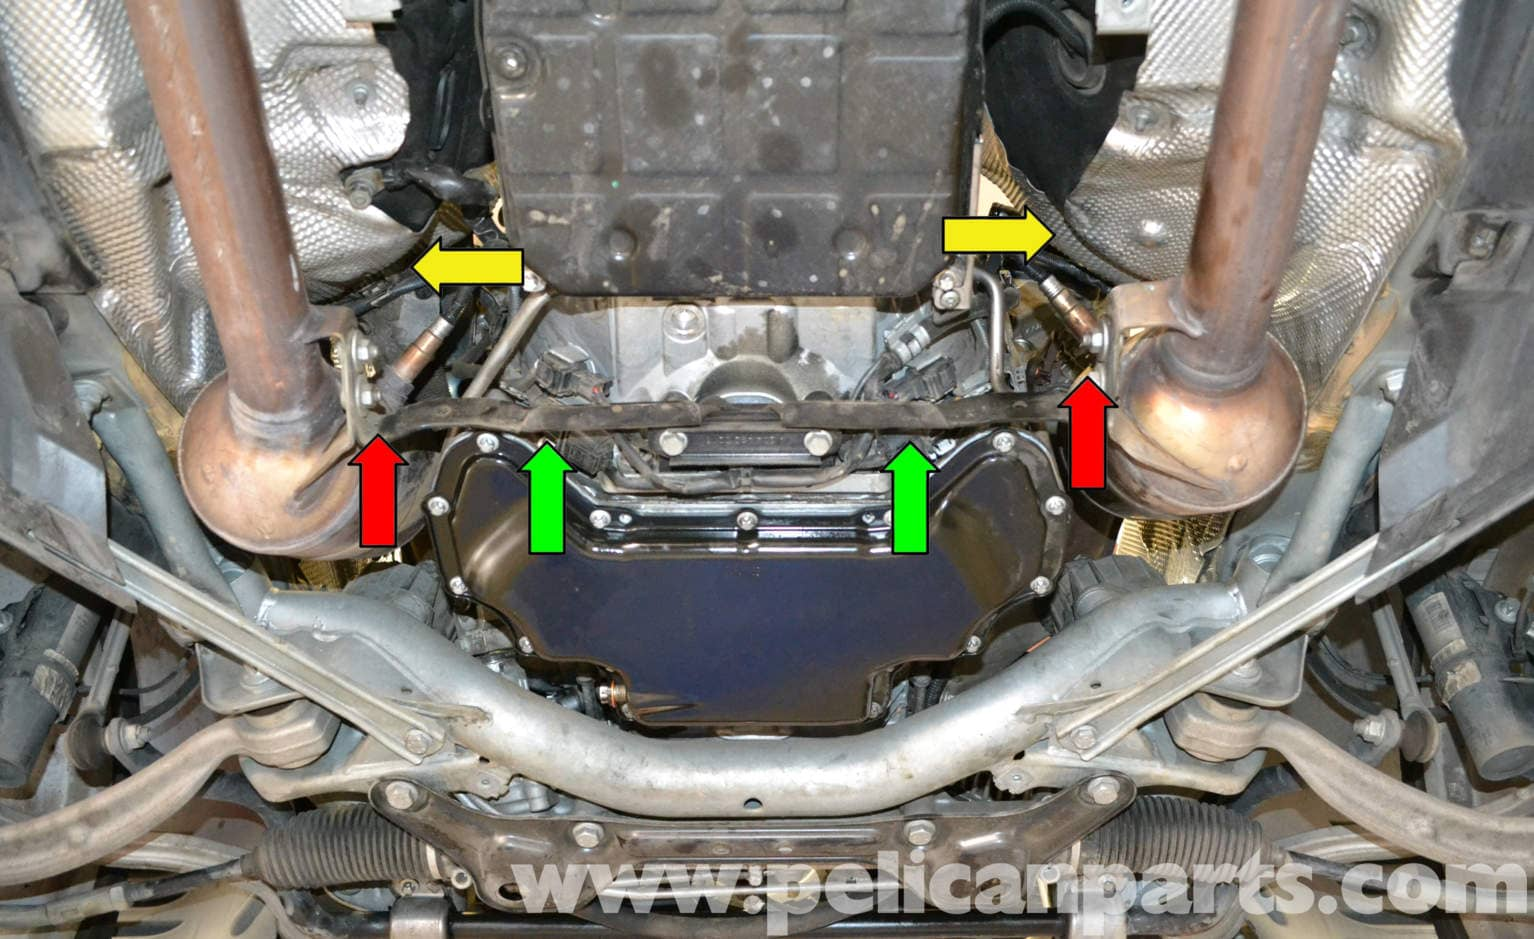 Mercedes Benz W204 Oxygen Sensor Replacement 2008 2014